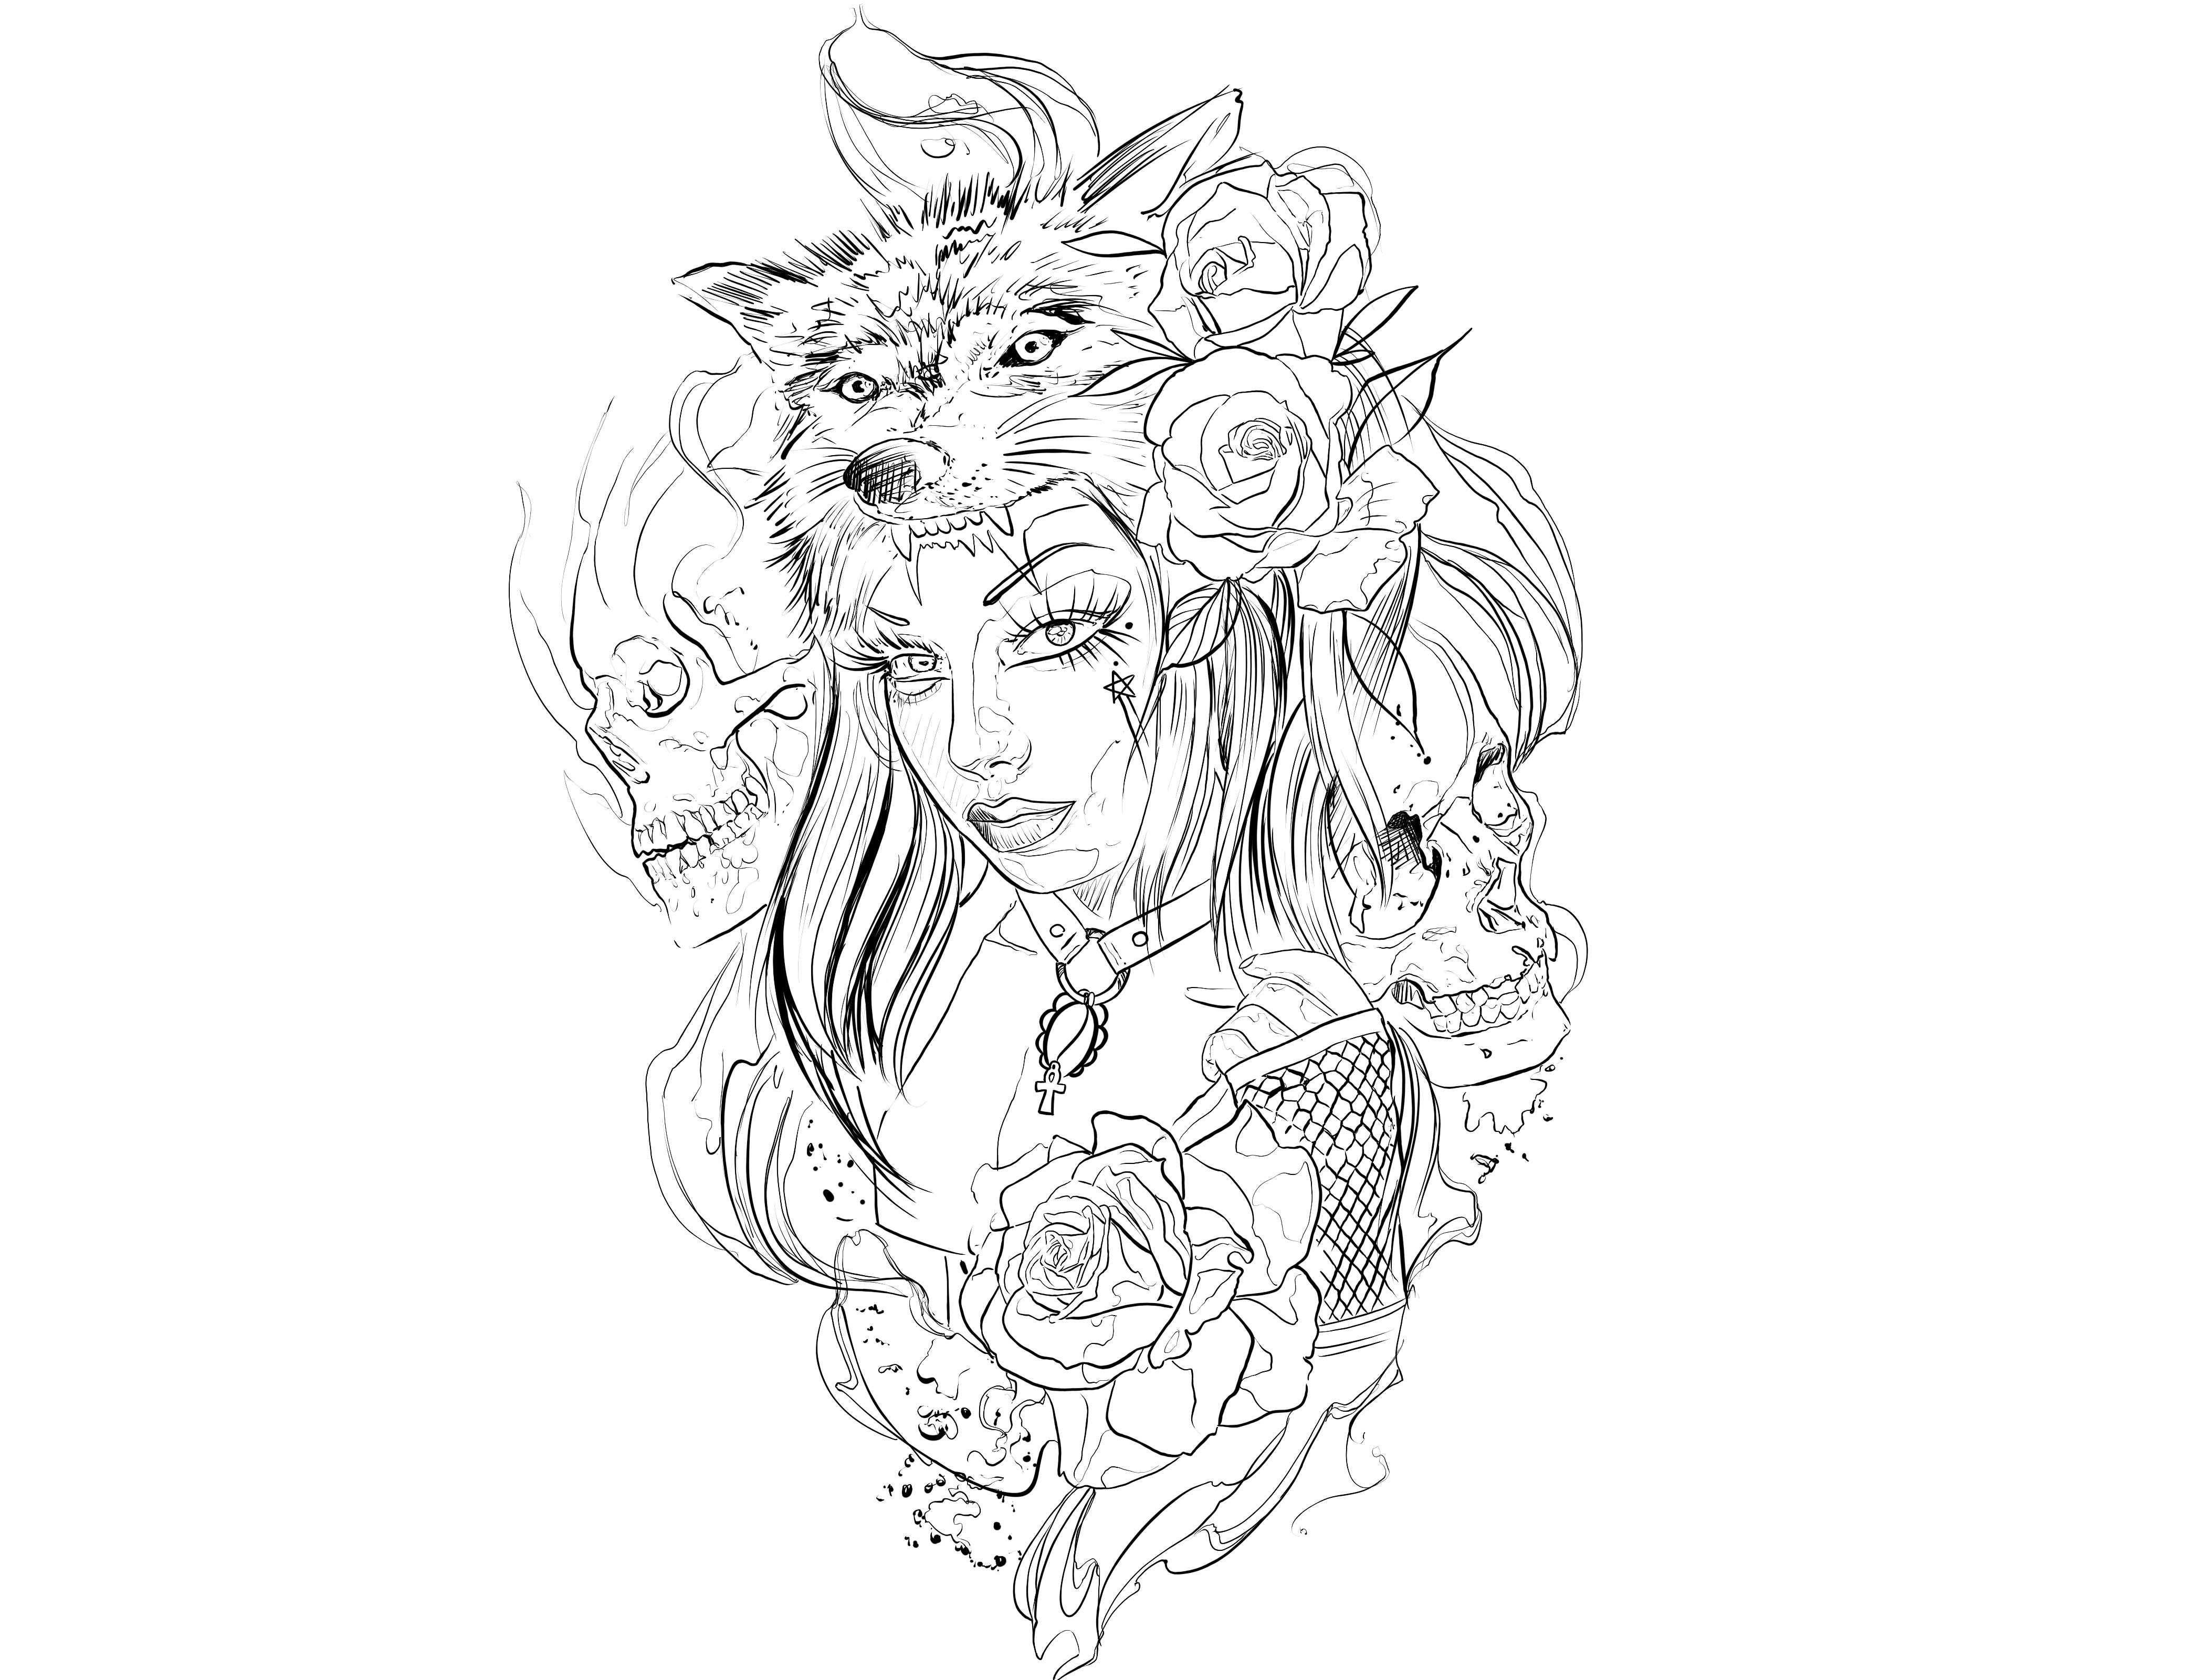 4200x3200 Wolf Skull Rosas Mulher Caveira Lobo Desenhos Tatoo